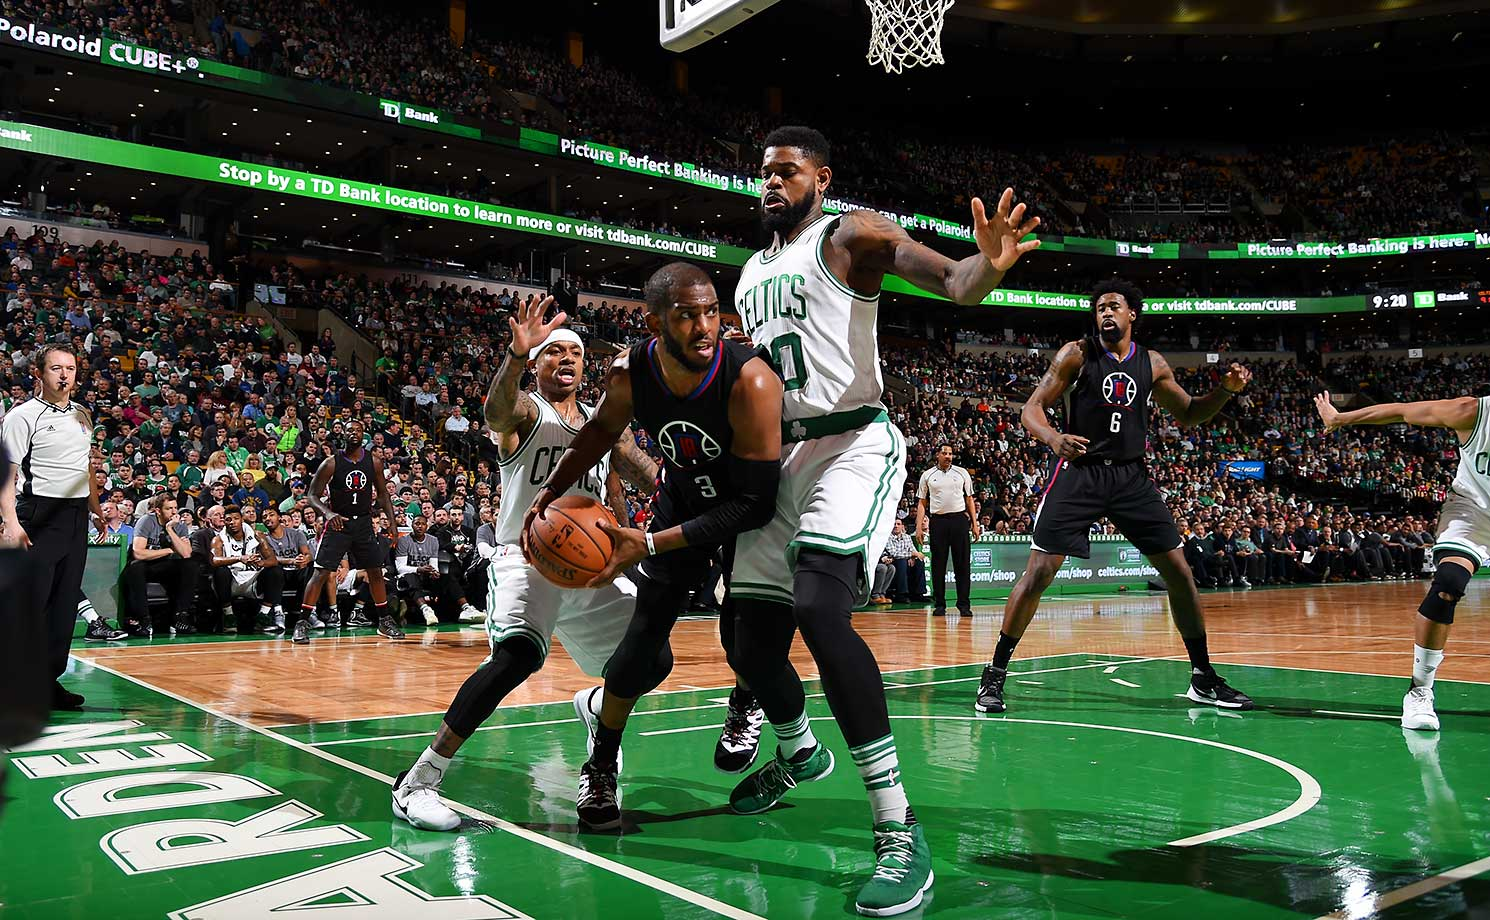 Chris Paul handles the ball against the Boston Celtics at the TD Garden.